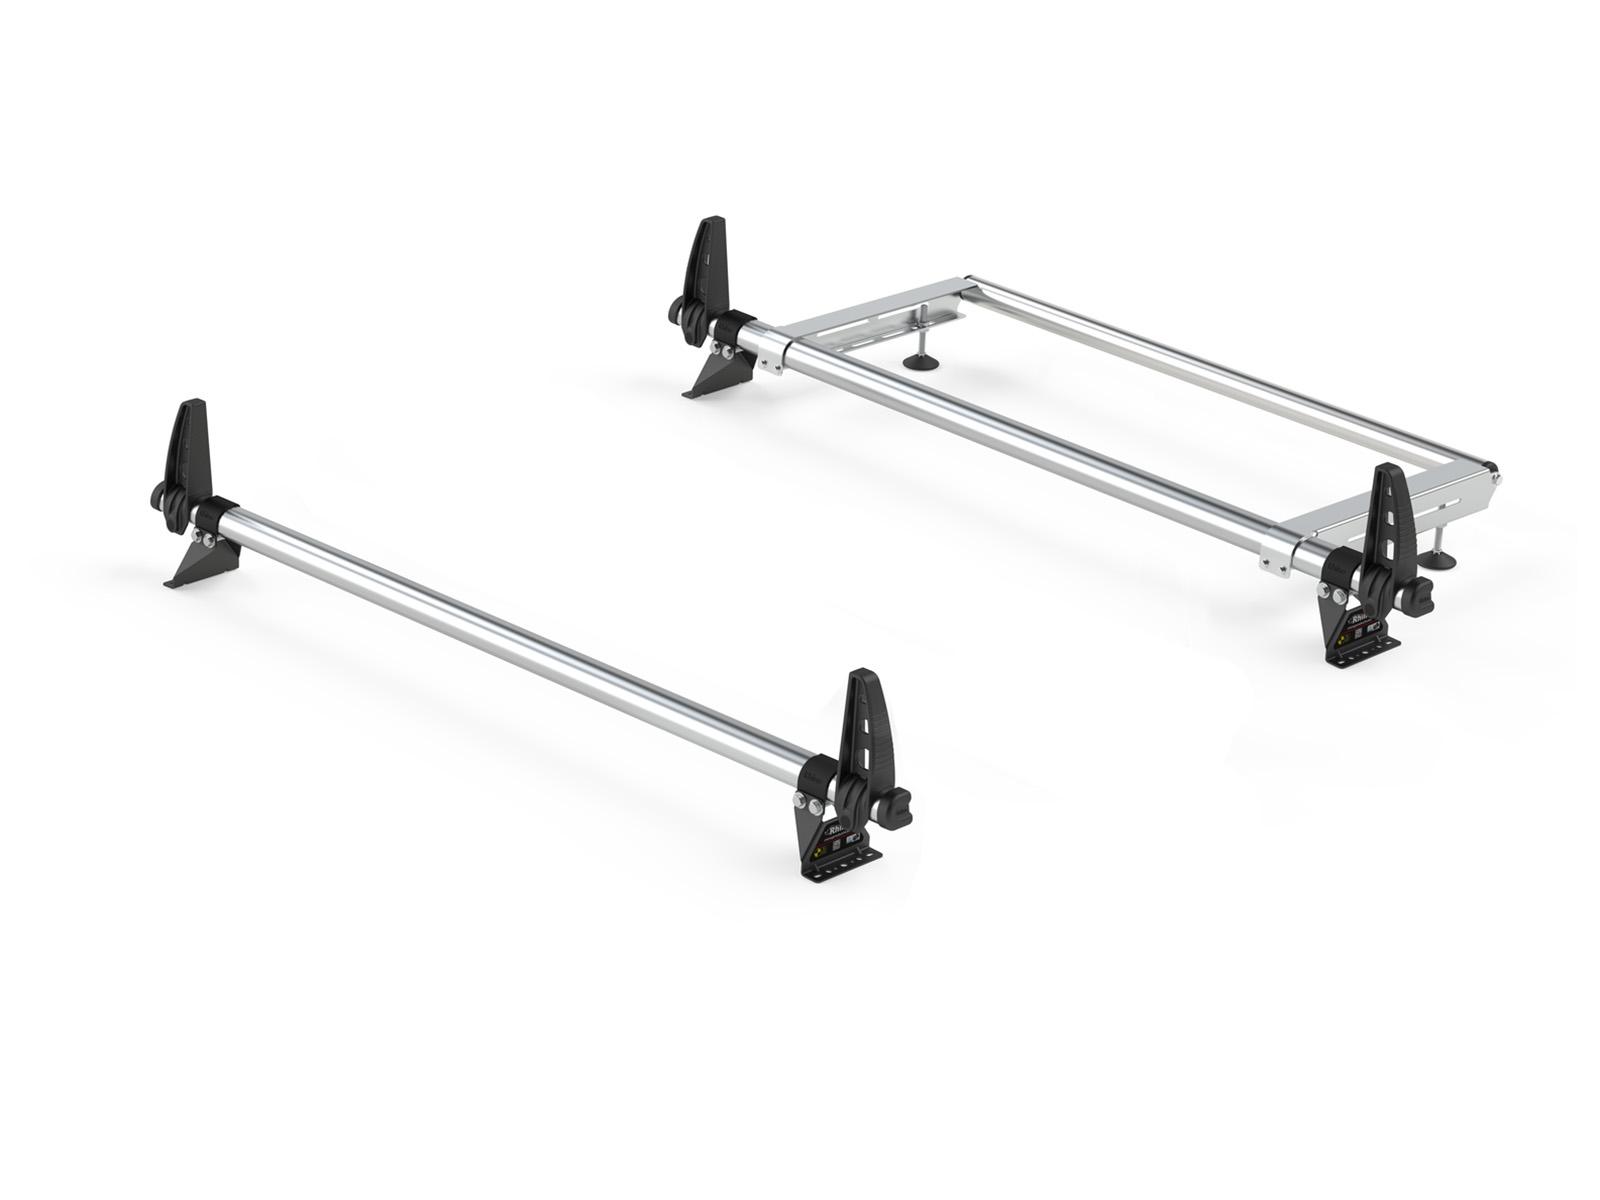 Rhino Delta 2 Bar Roof Bars Ladder Roller For Ford Transit